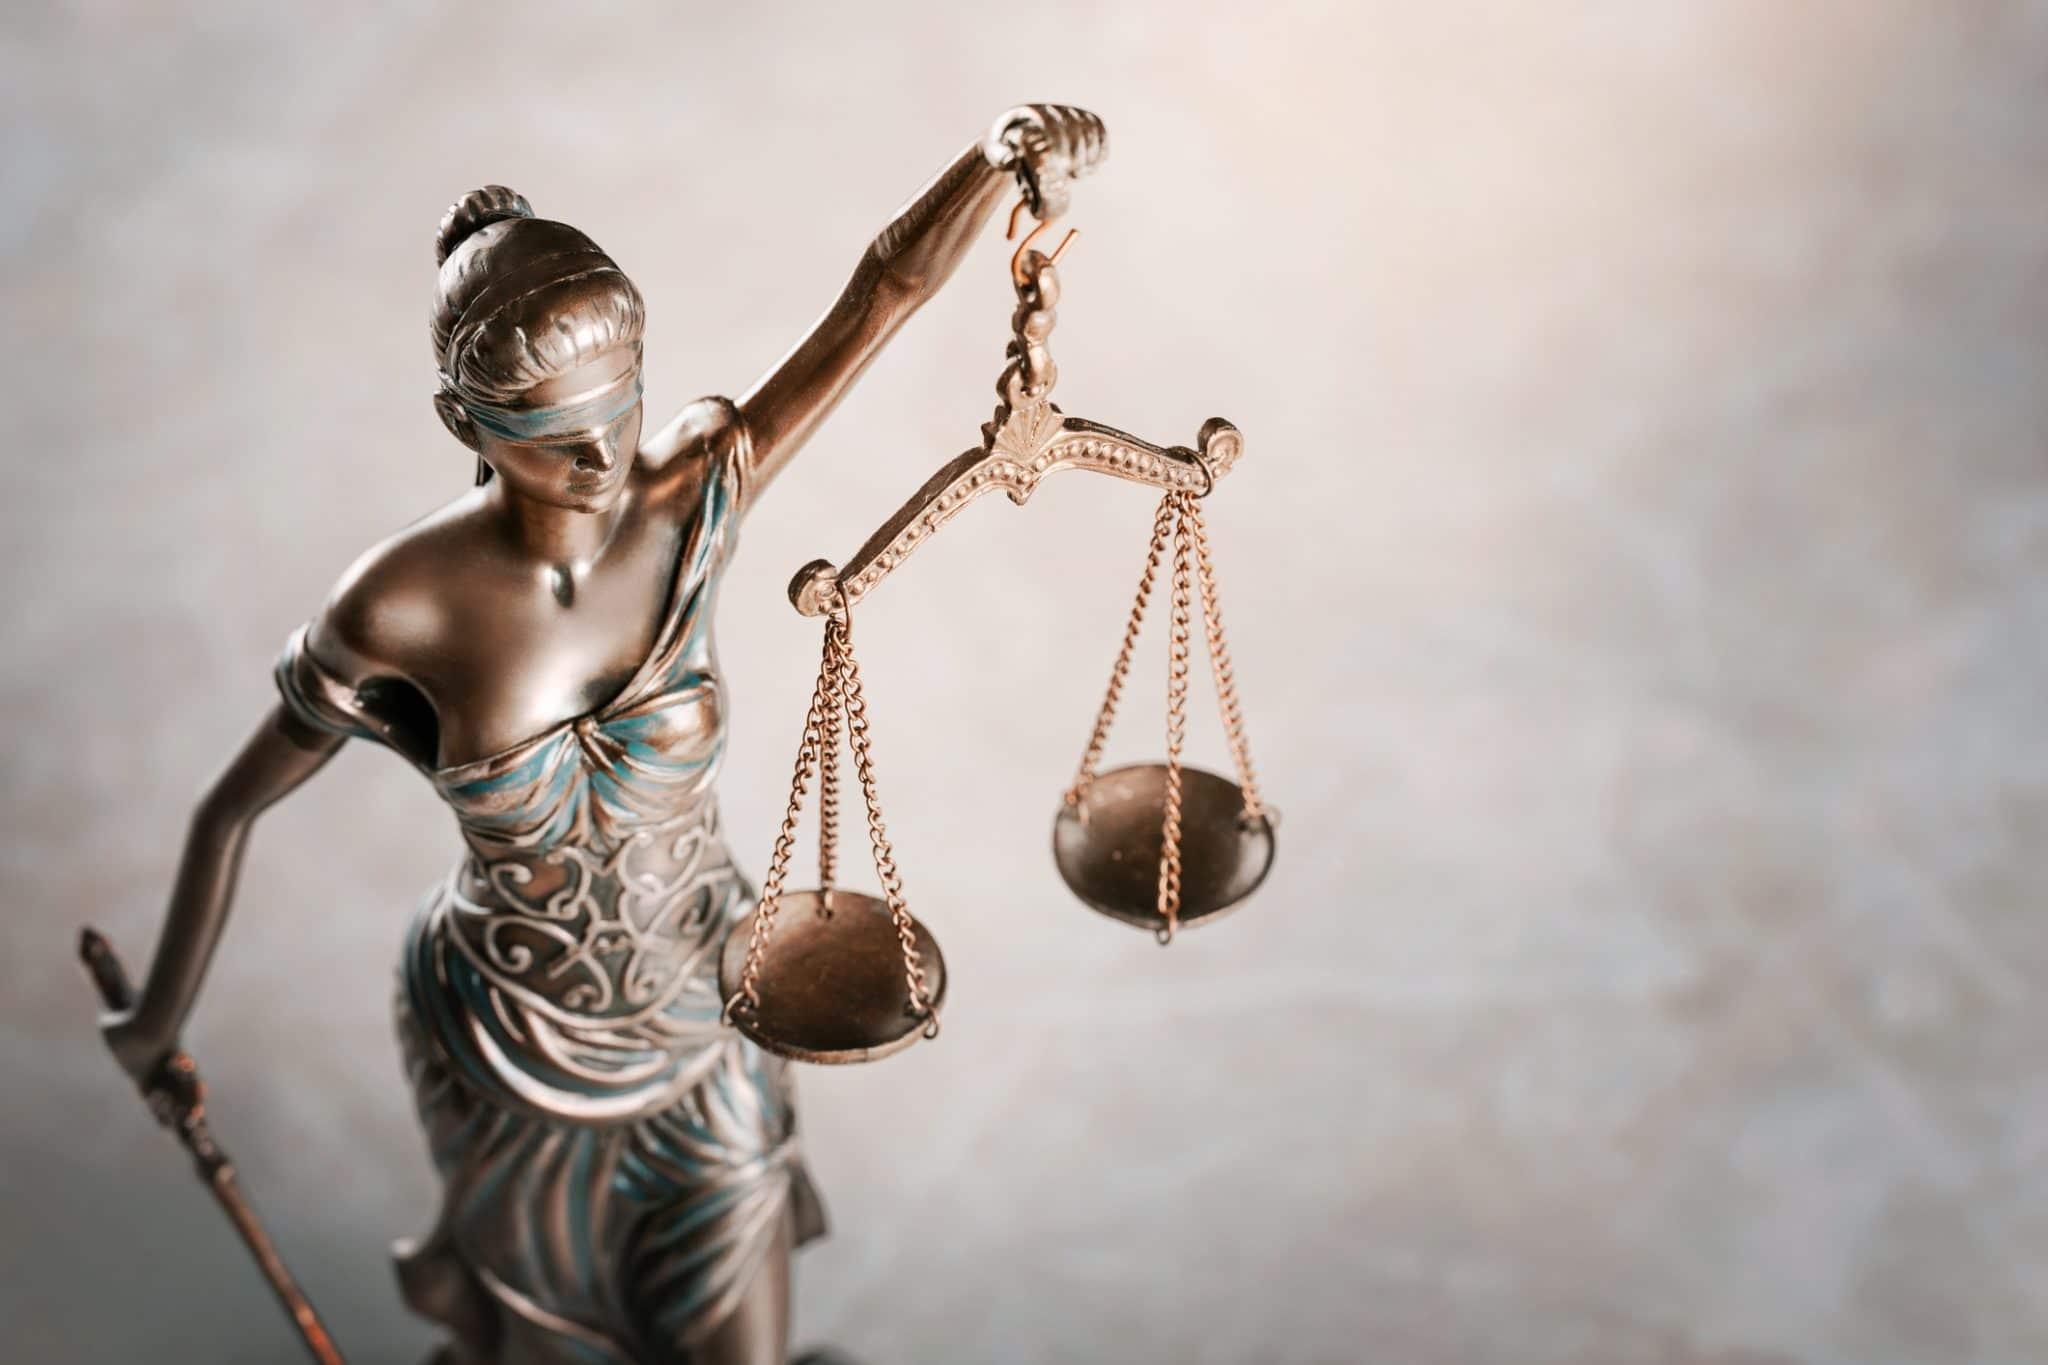 Law School Online >> Online Law Degree Programs A New Road To Law School Success